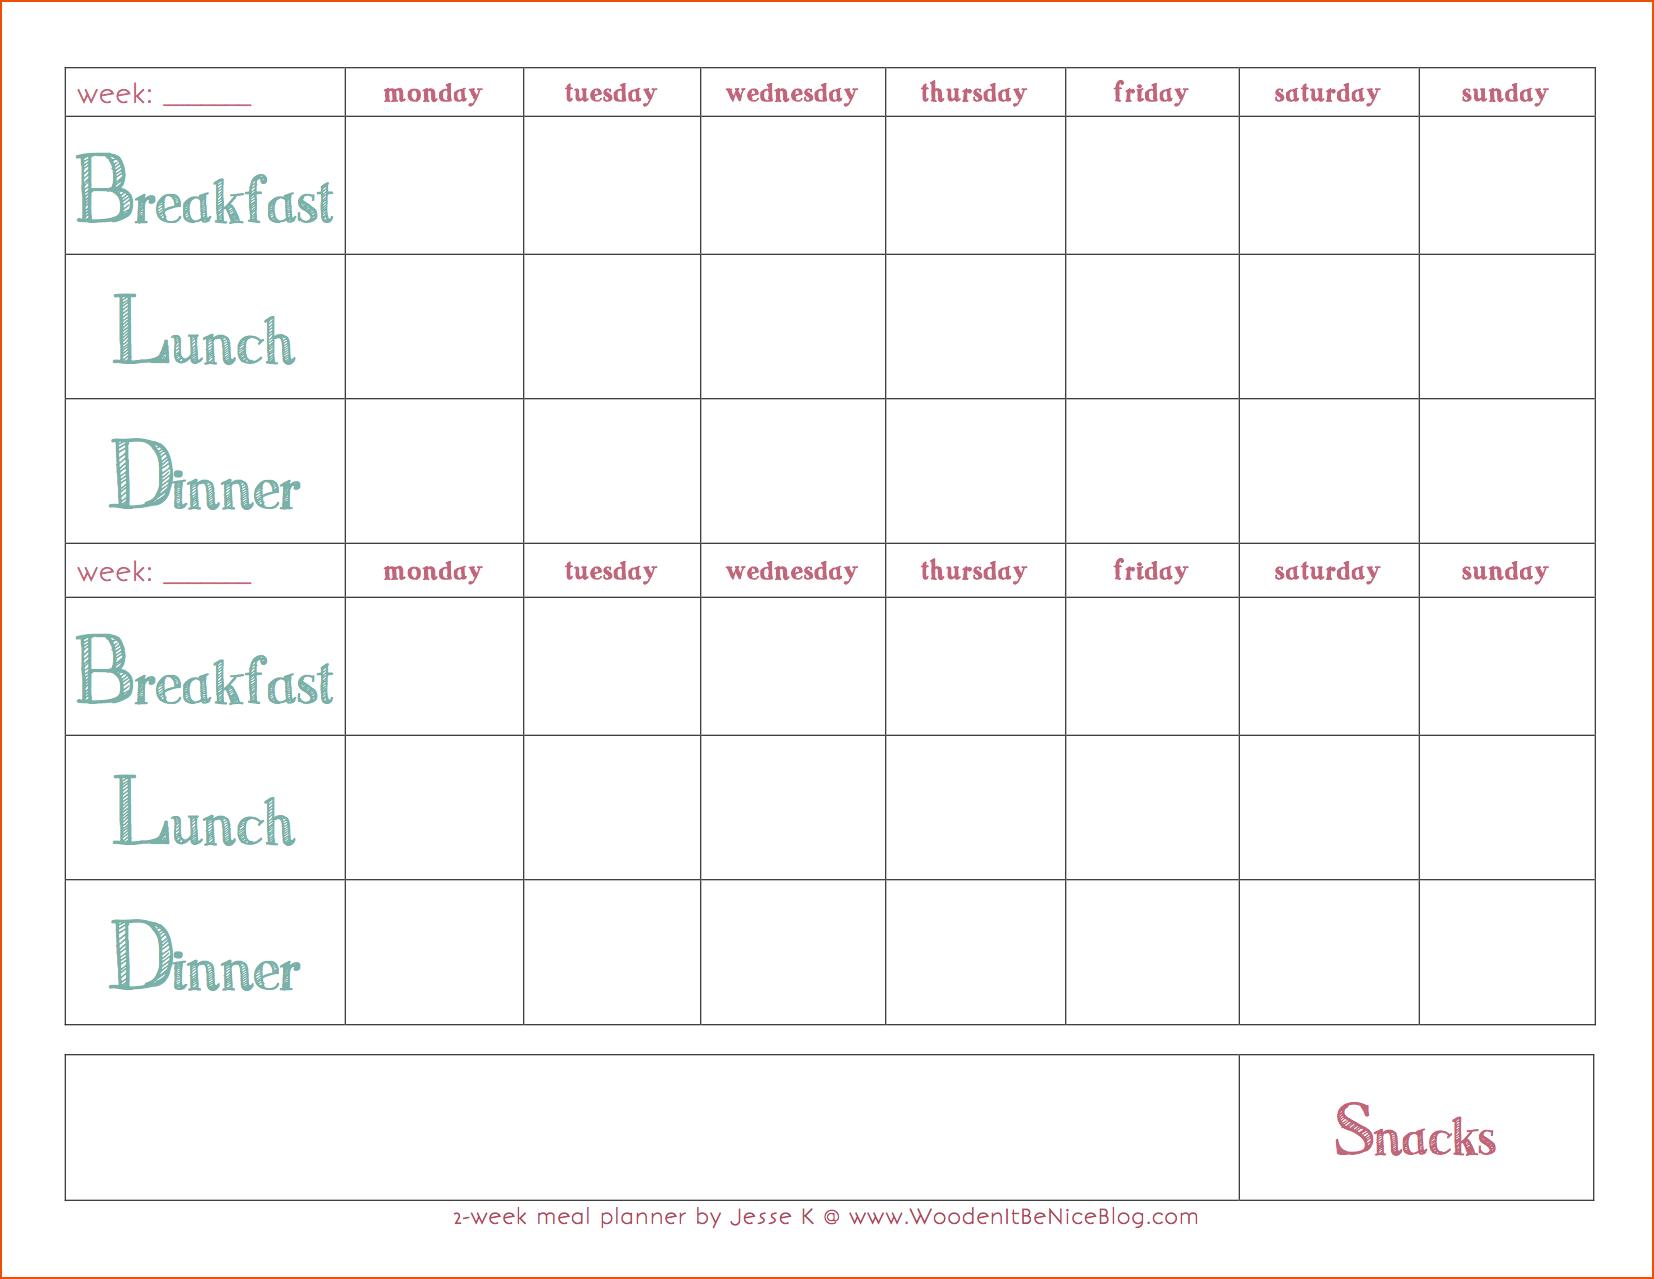 Weekly-Meal-Plan-Template-2Weekmealplanner-Coastal 5 Day Monthly Calendar Template Word